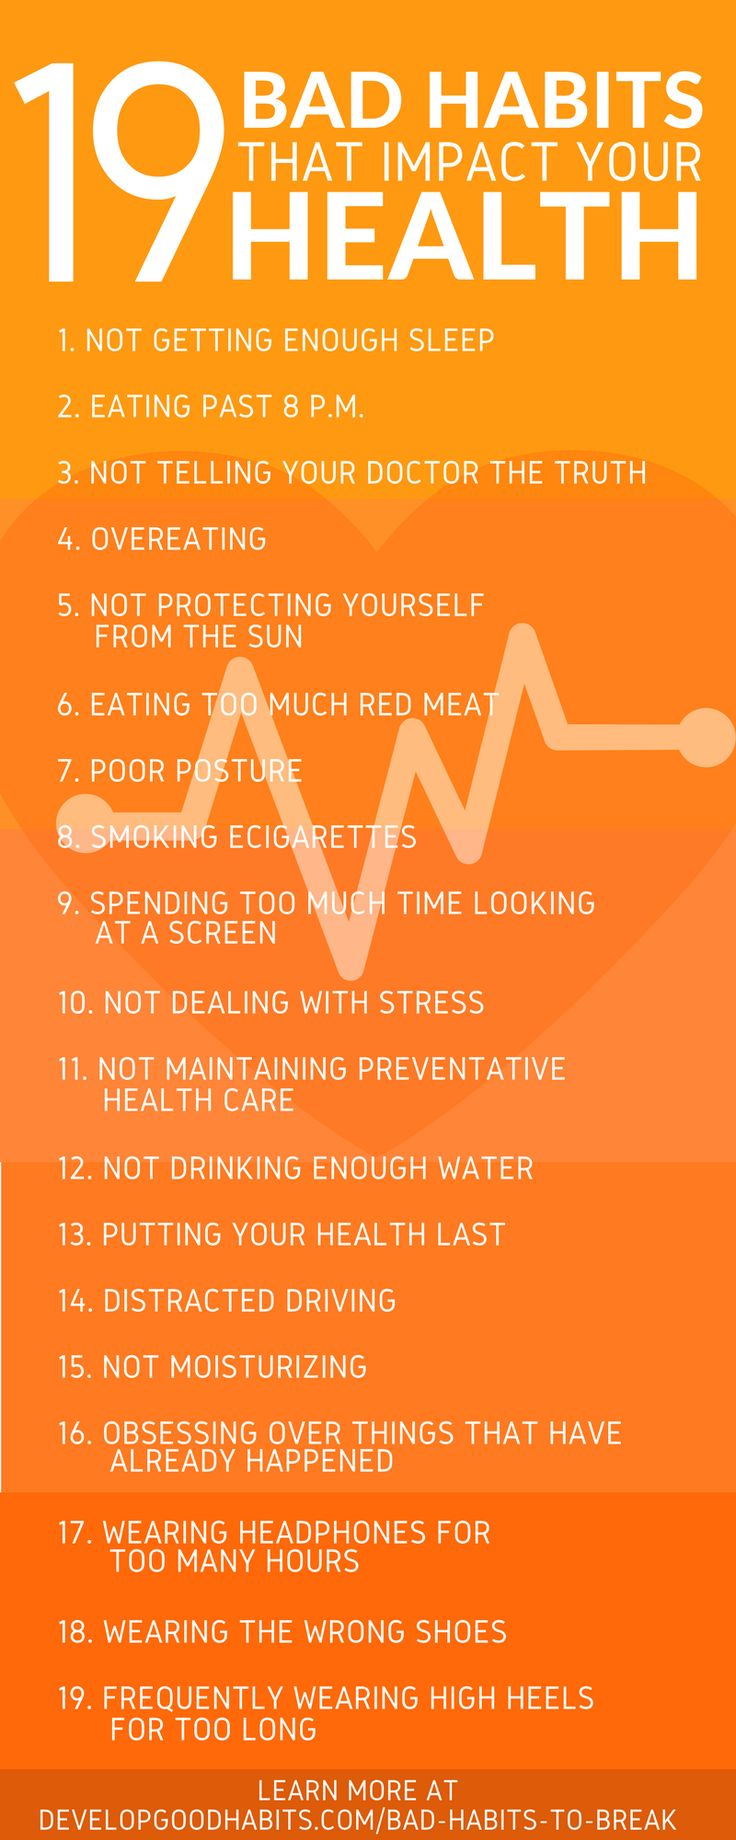 283 Bad Habits (The ULTIMATE List of Bad Habits)